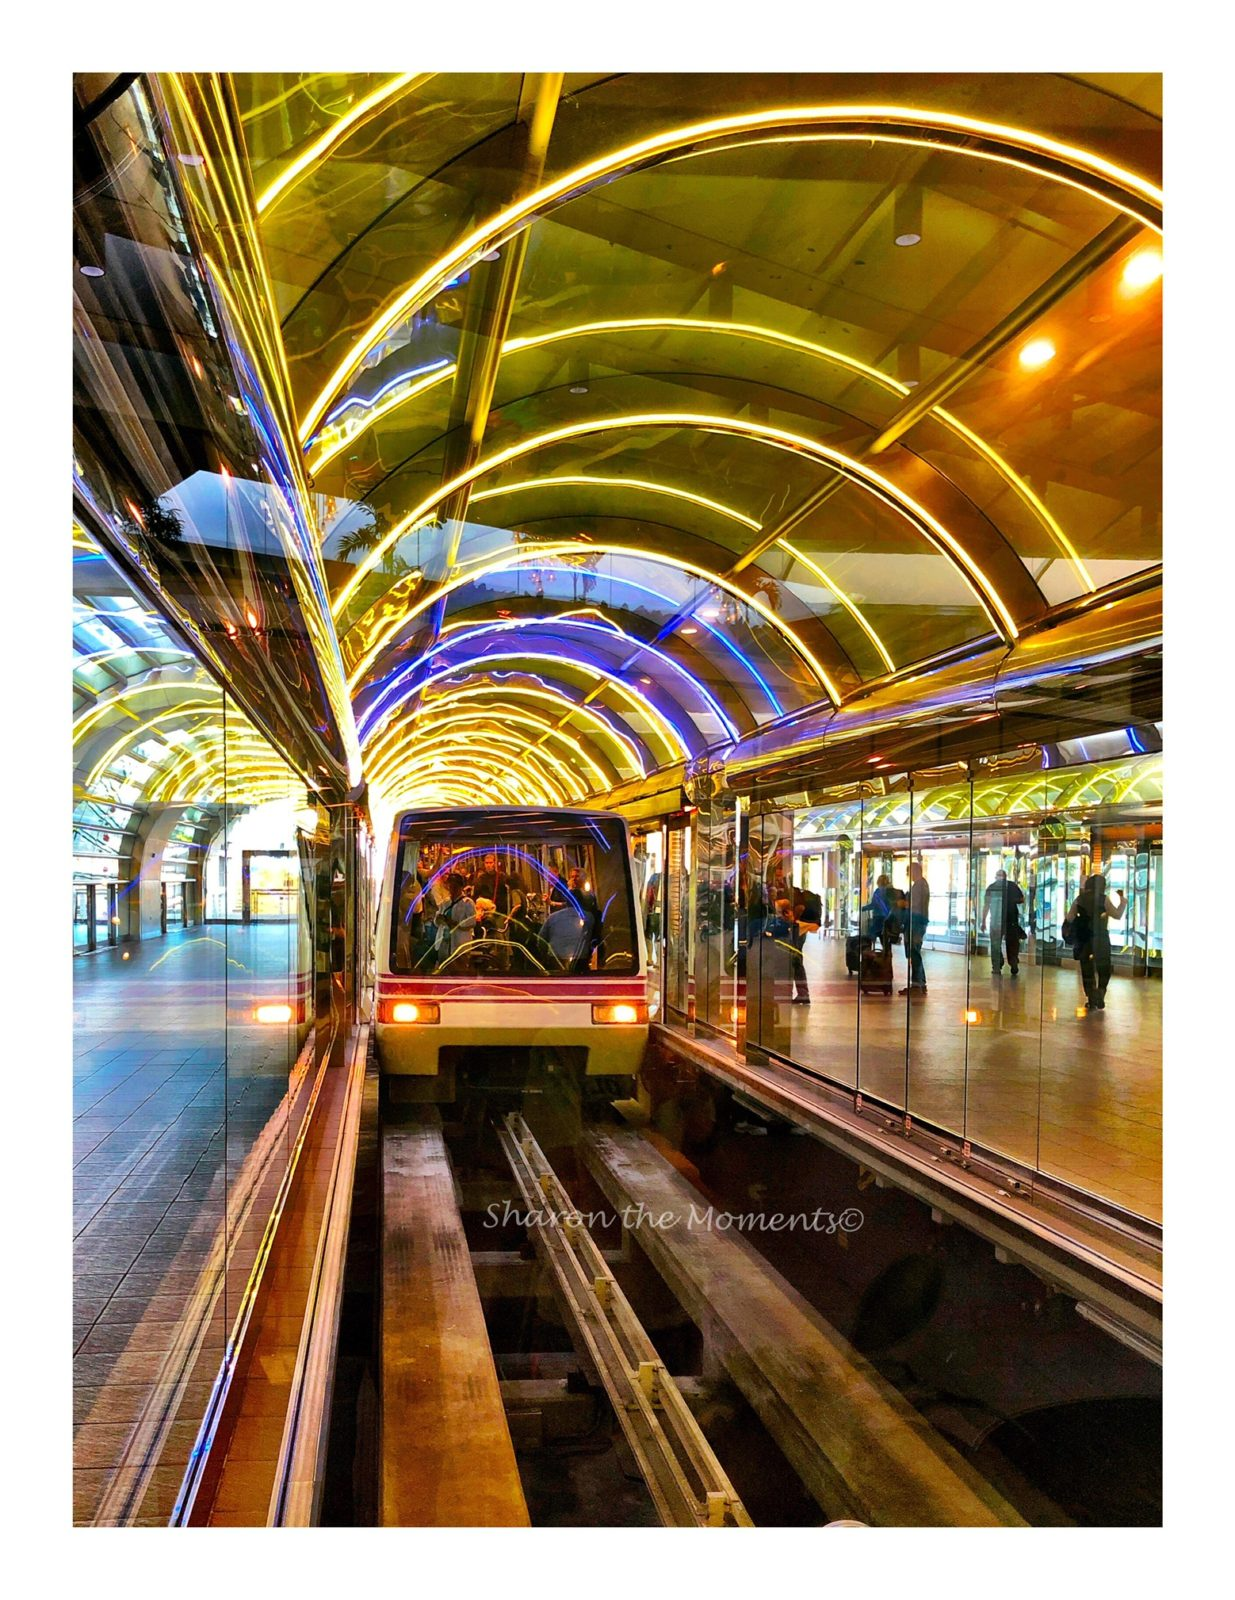 Stunning Lights & Reflections, Orlando Airport || Sharon the Moments Blog